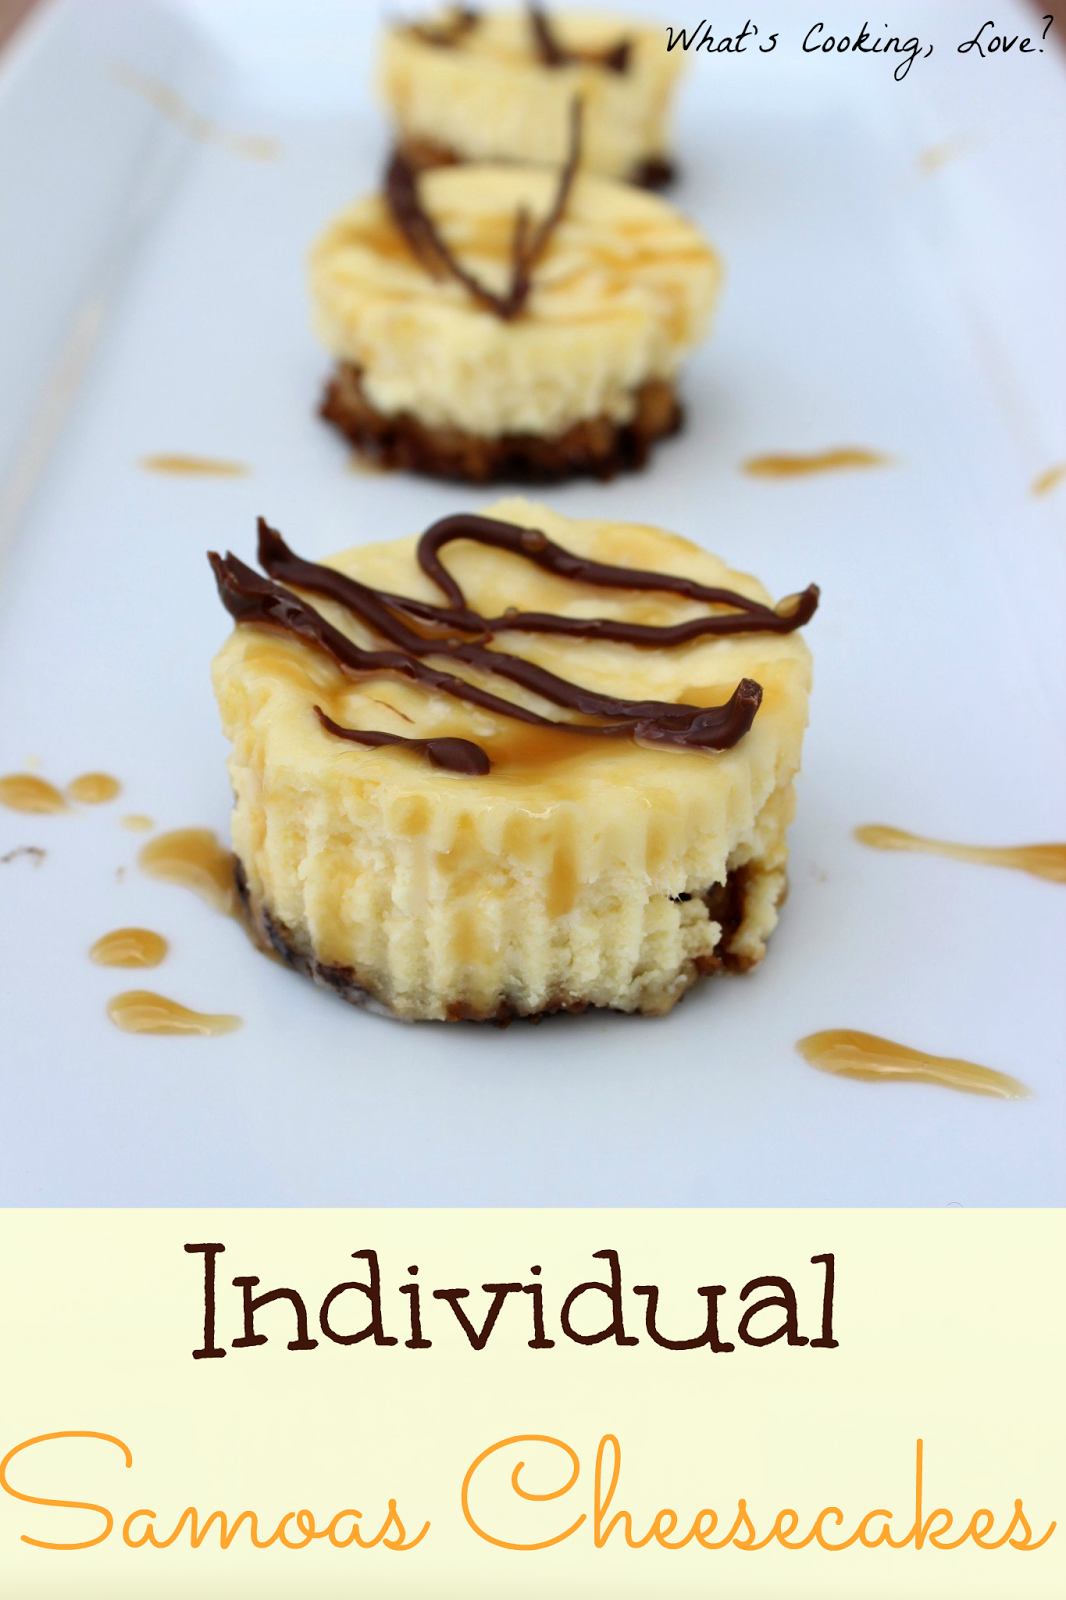 Individual Samoas Cheesecakes